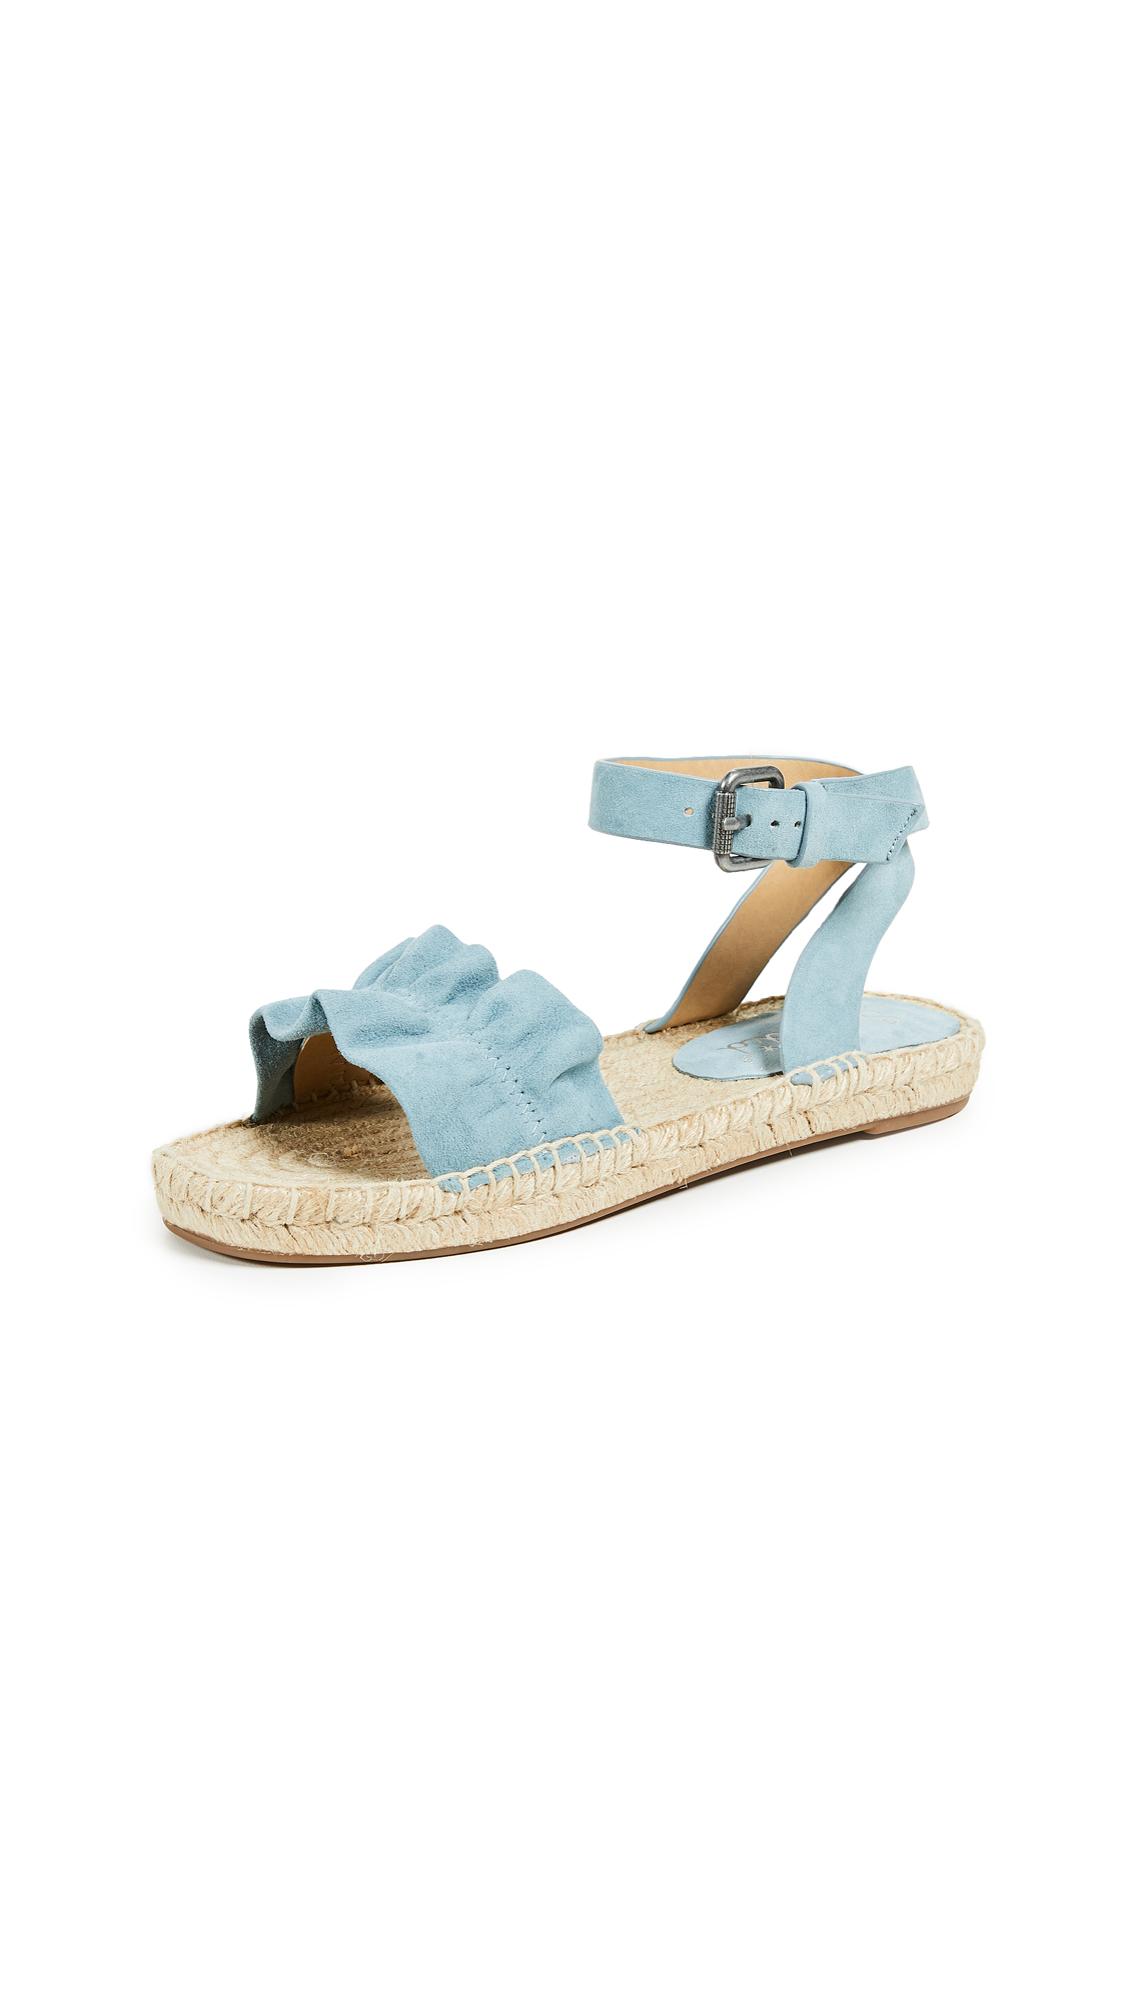 Splendid Becca Ankle Strap Espadrilles - Shadow Blue